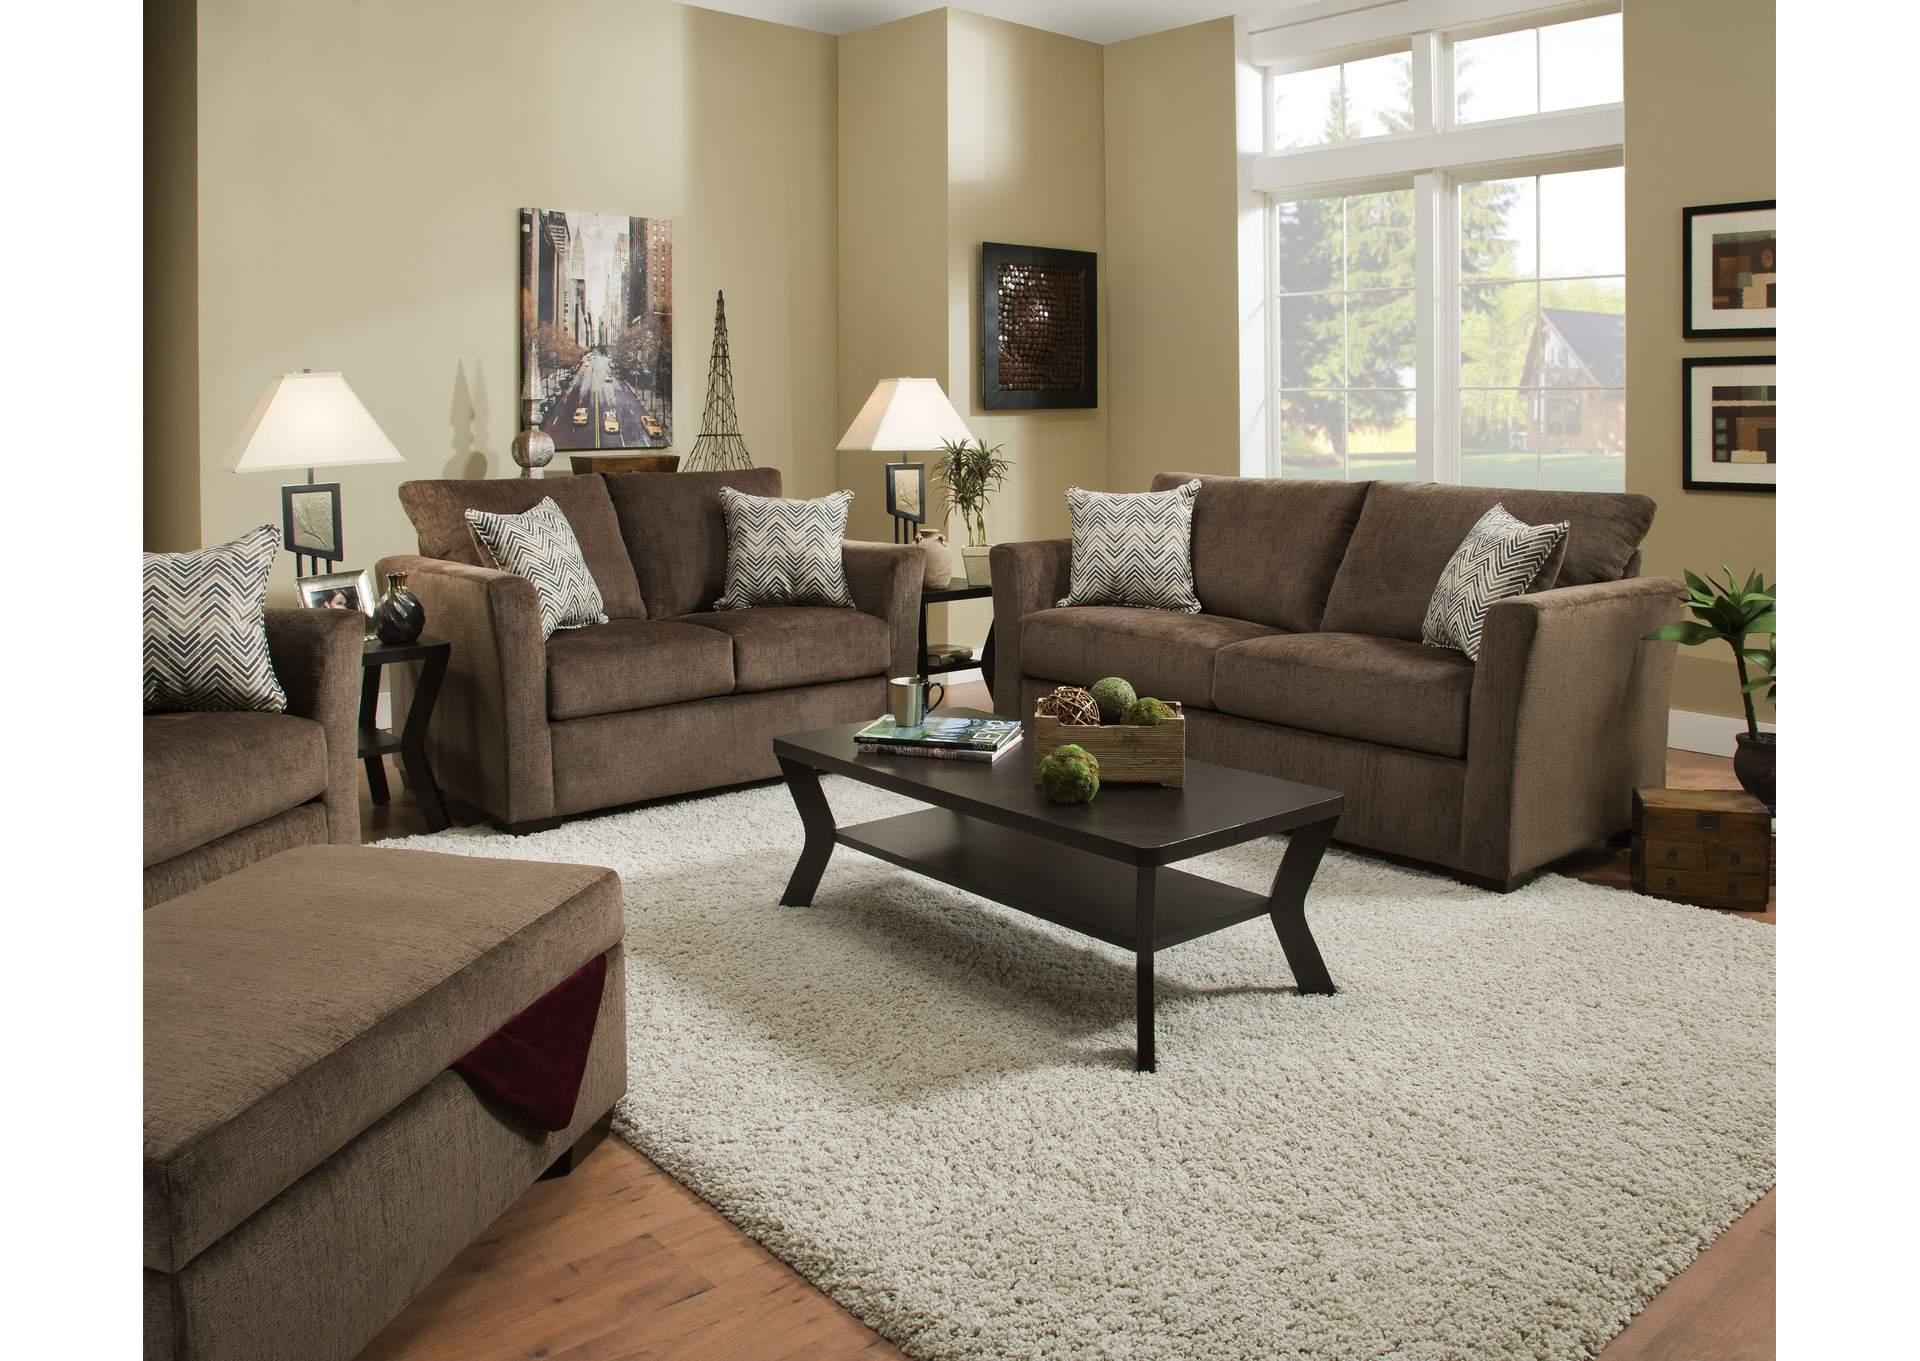 4206 Loveseat – Elan Coffee / Webster Olive Sit & Sleep Within Popular Walker Gray Power Reclining Sofas (View 18 of 20)